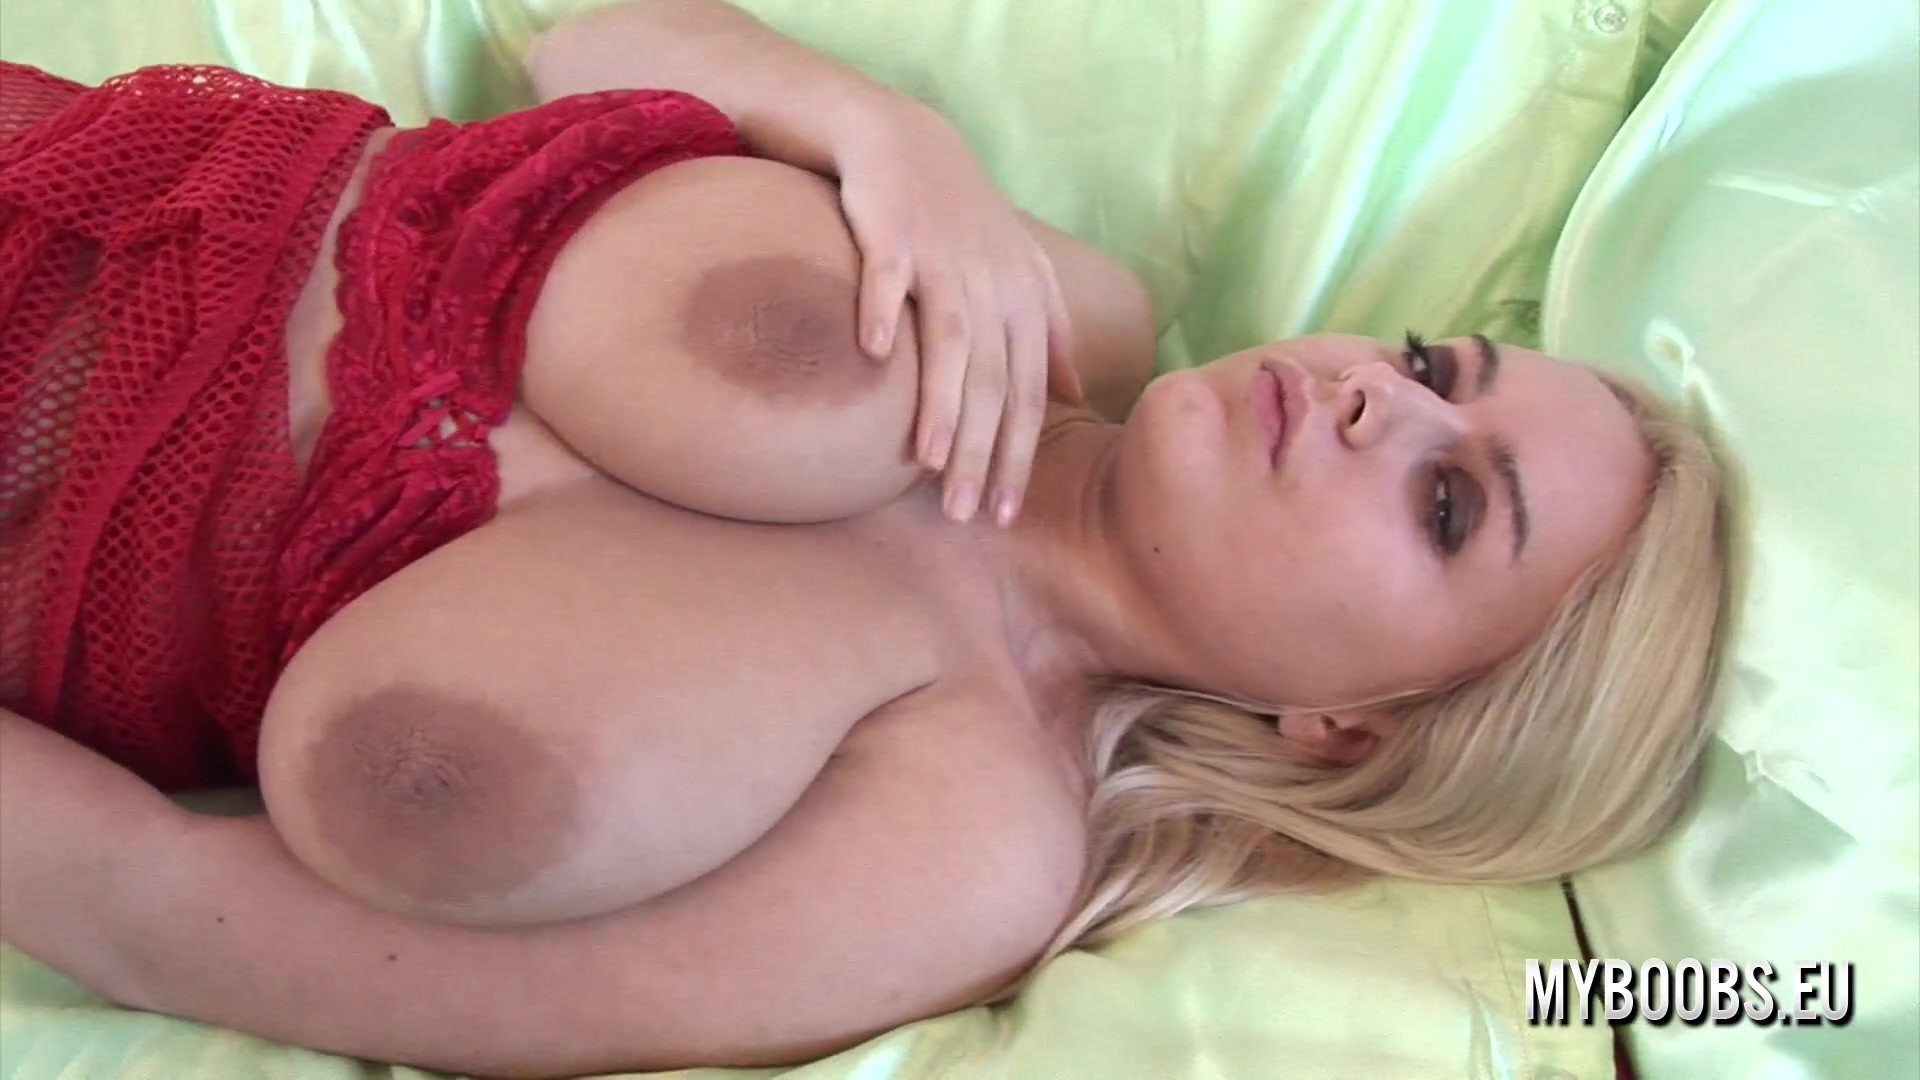 MyBoobs - Melissa Mandlikova Masturbate With Silver Vibrator In Red Lingerie - 1080p HDRip (08-13...